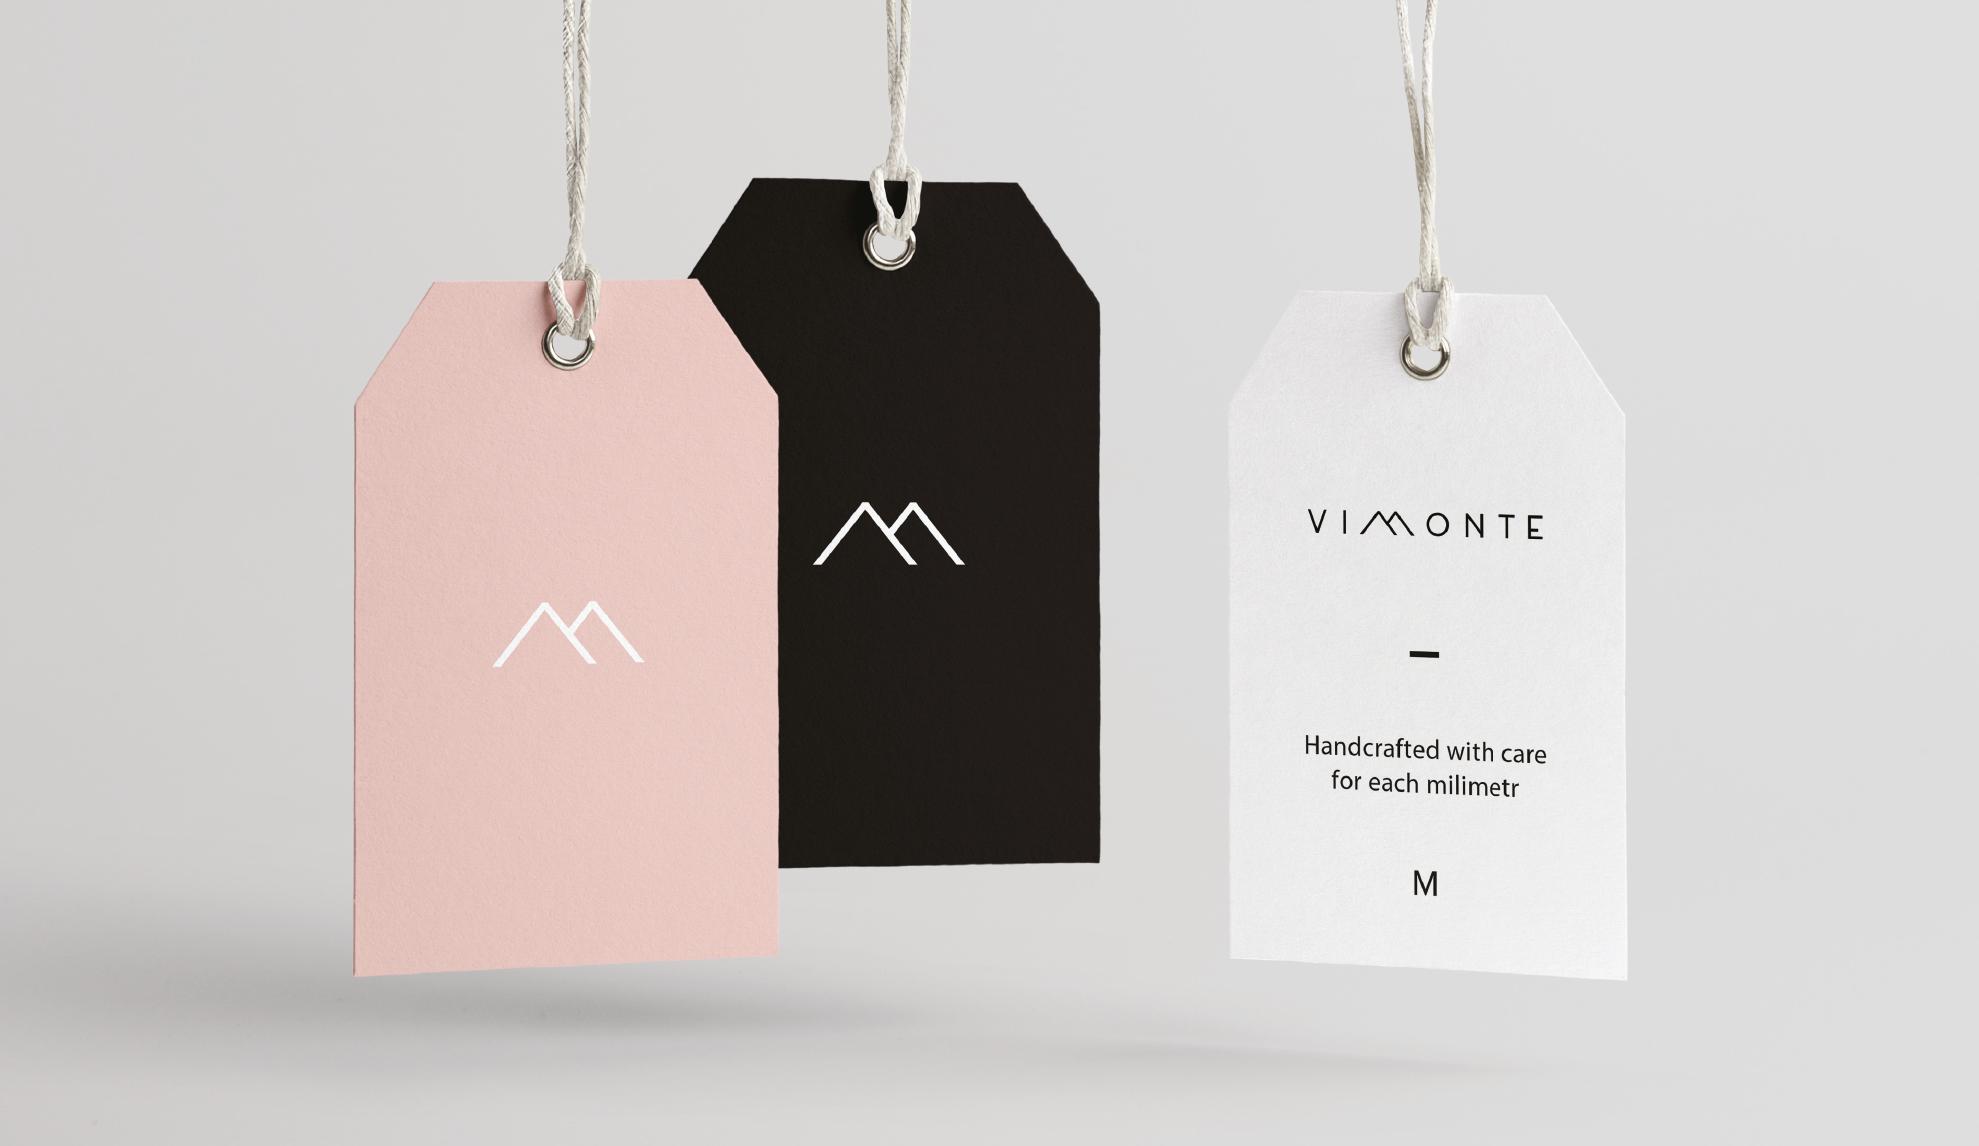 Брендинг для VIMONTE-image-left-down